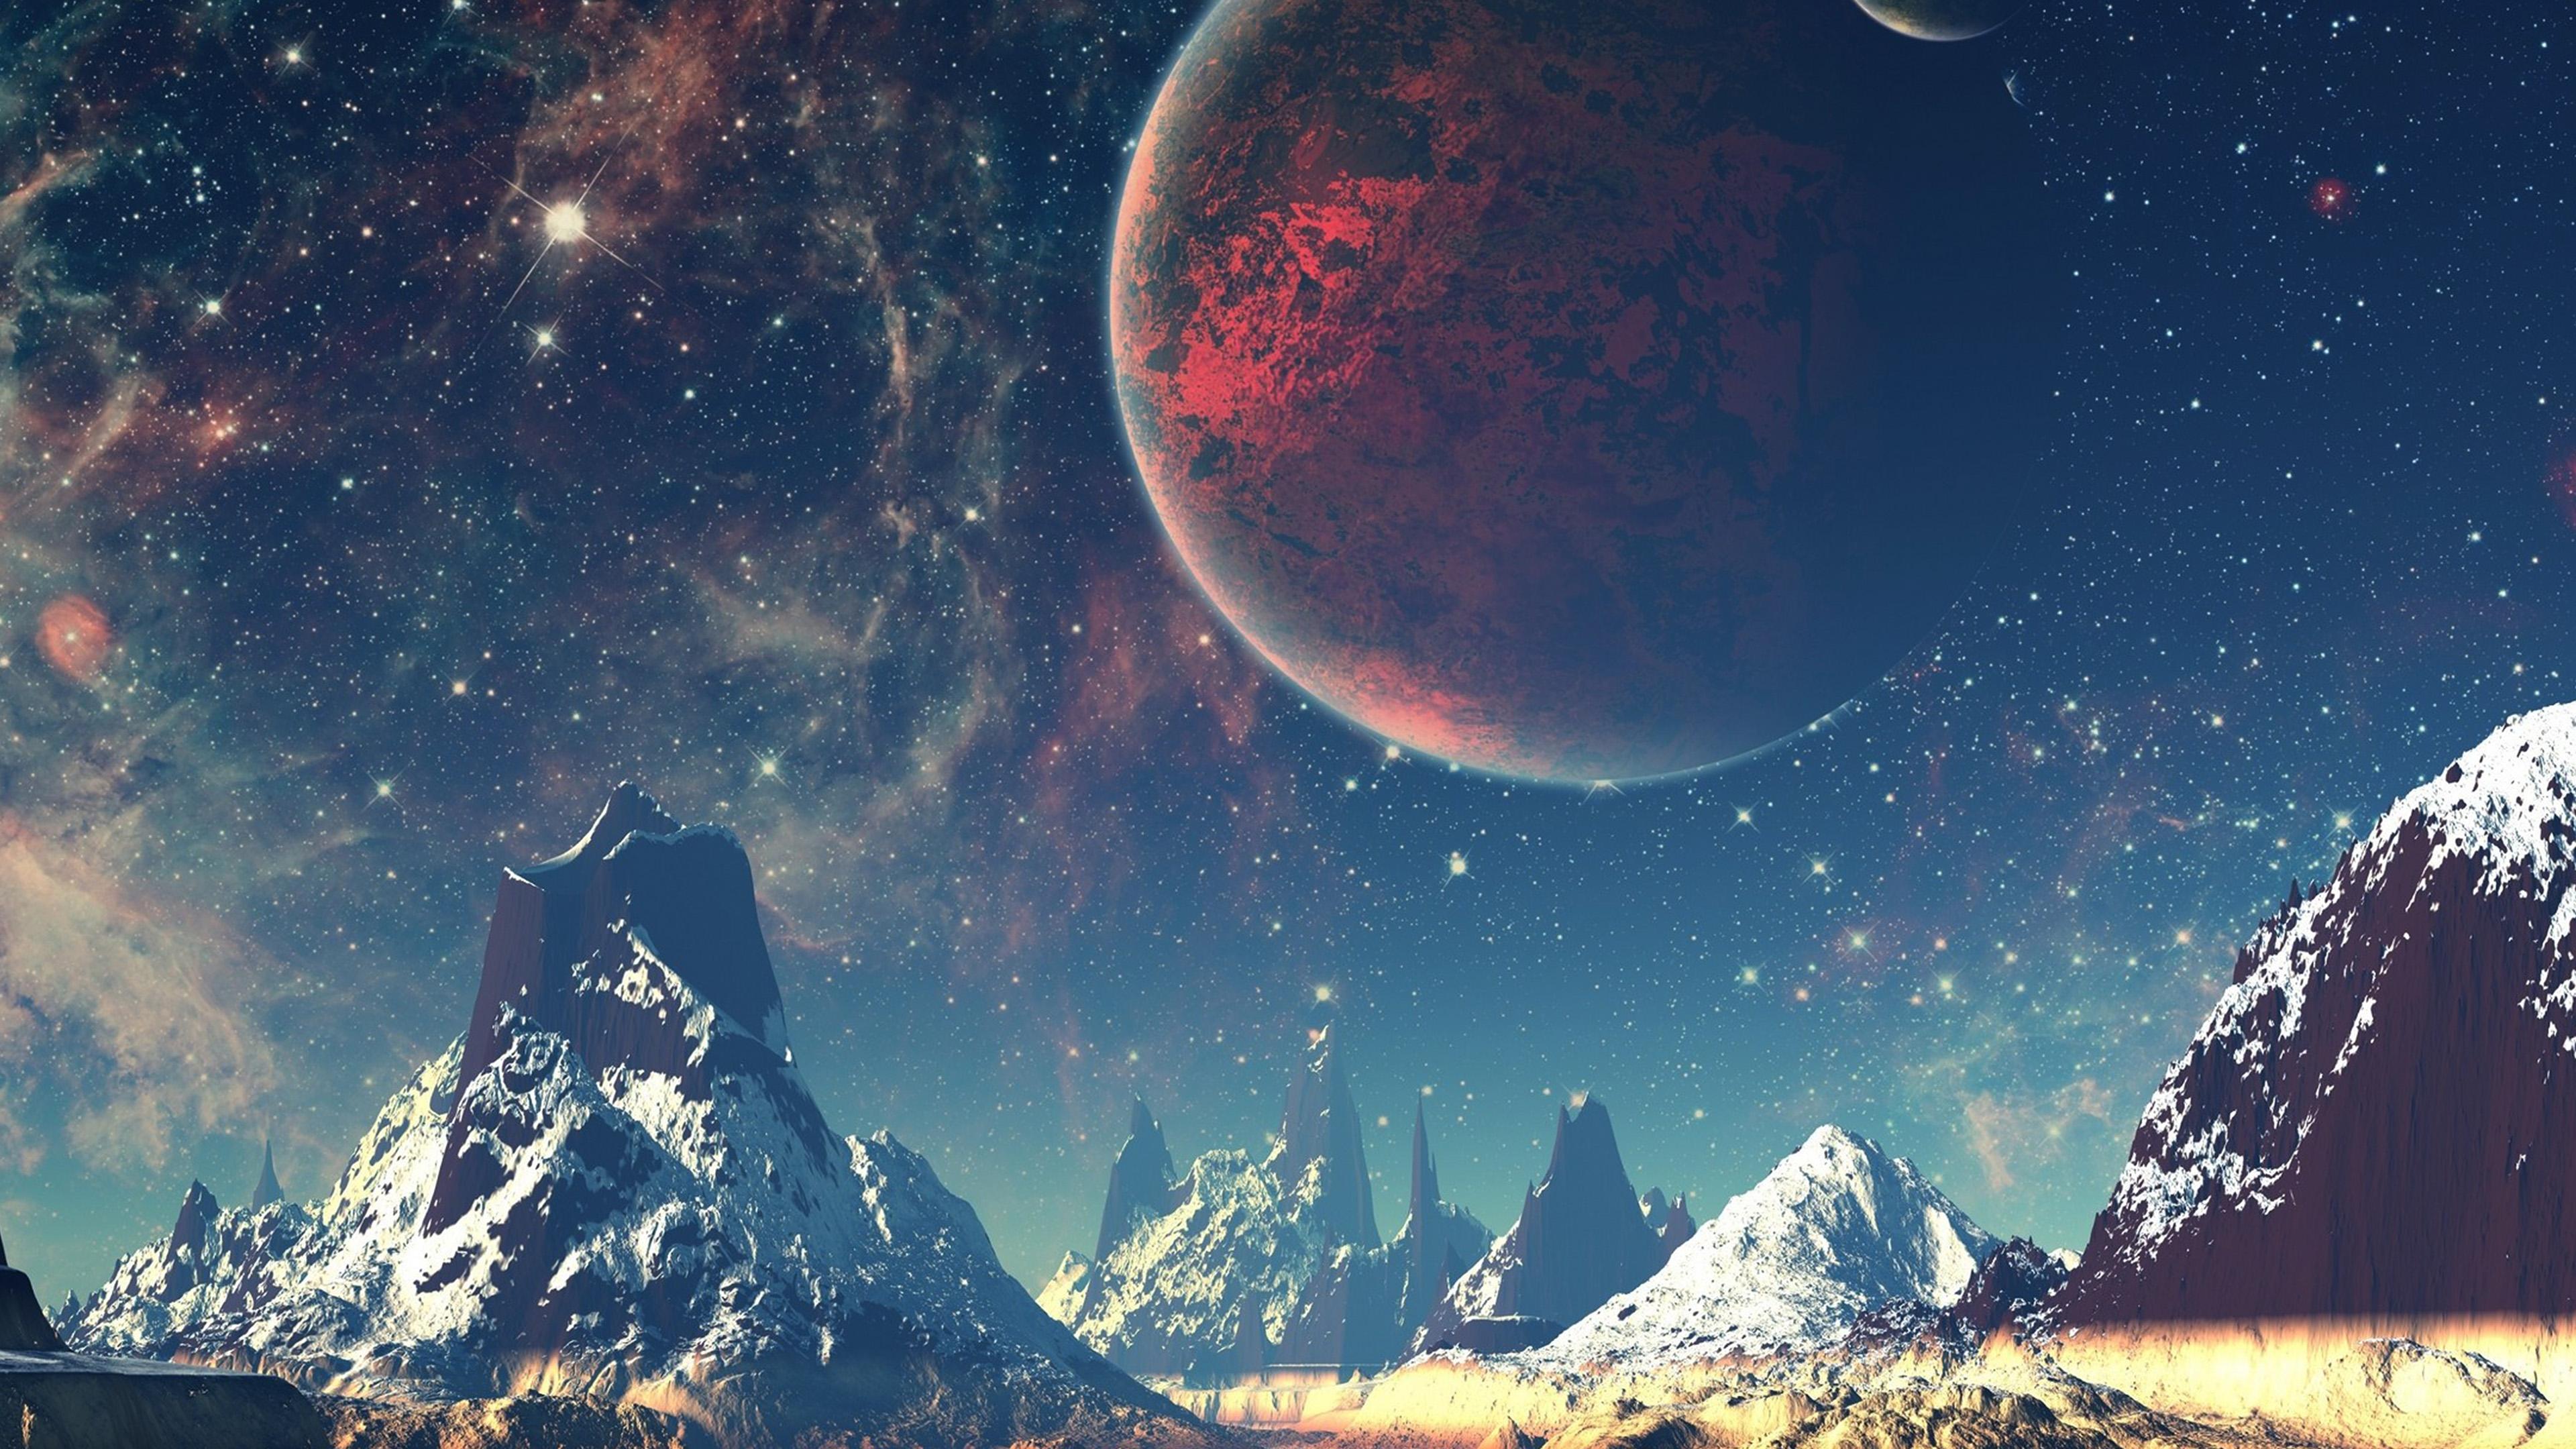 aq10-dream-space-world-mountain-sky-star-illustration ...